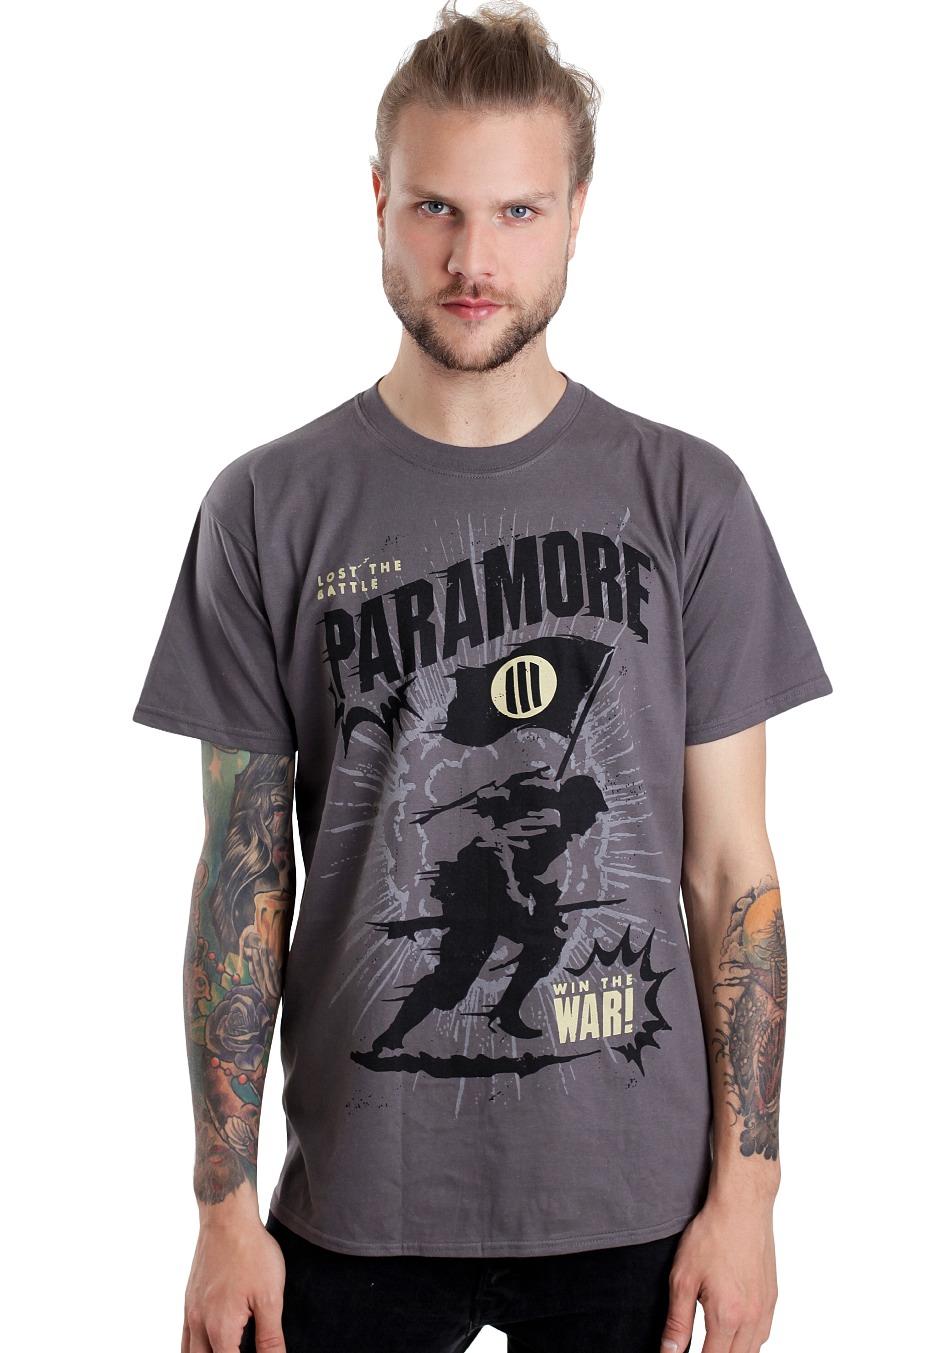 Paramore - Mine Field Heather Grey - T-Shirt - Official ... Paramore Mersch Nederland